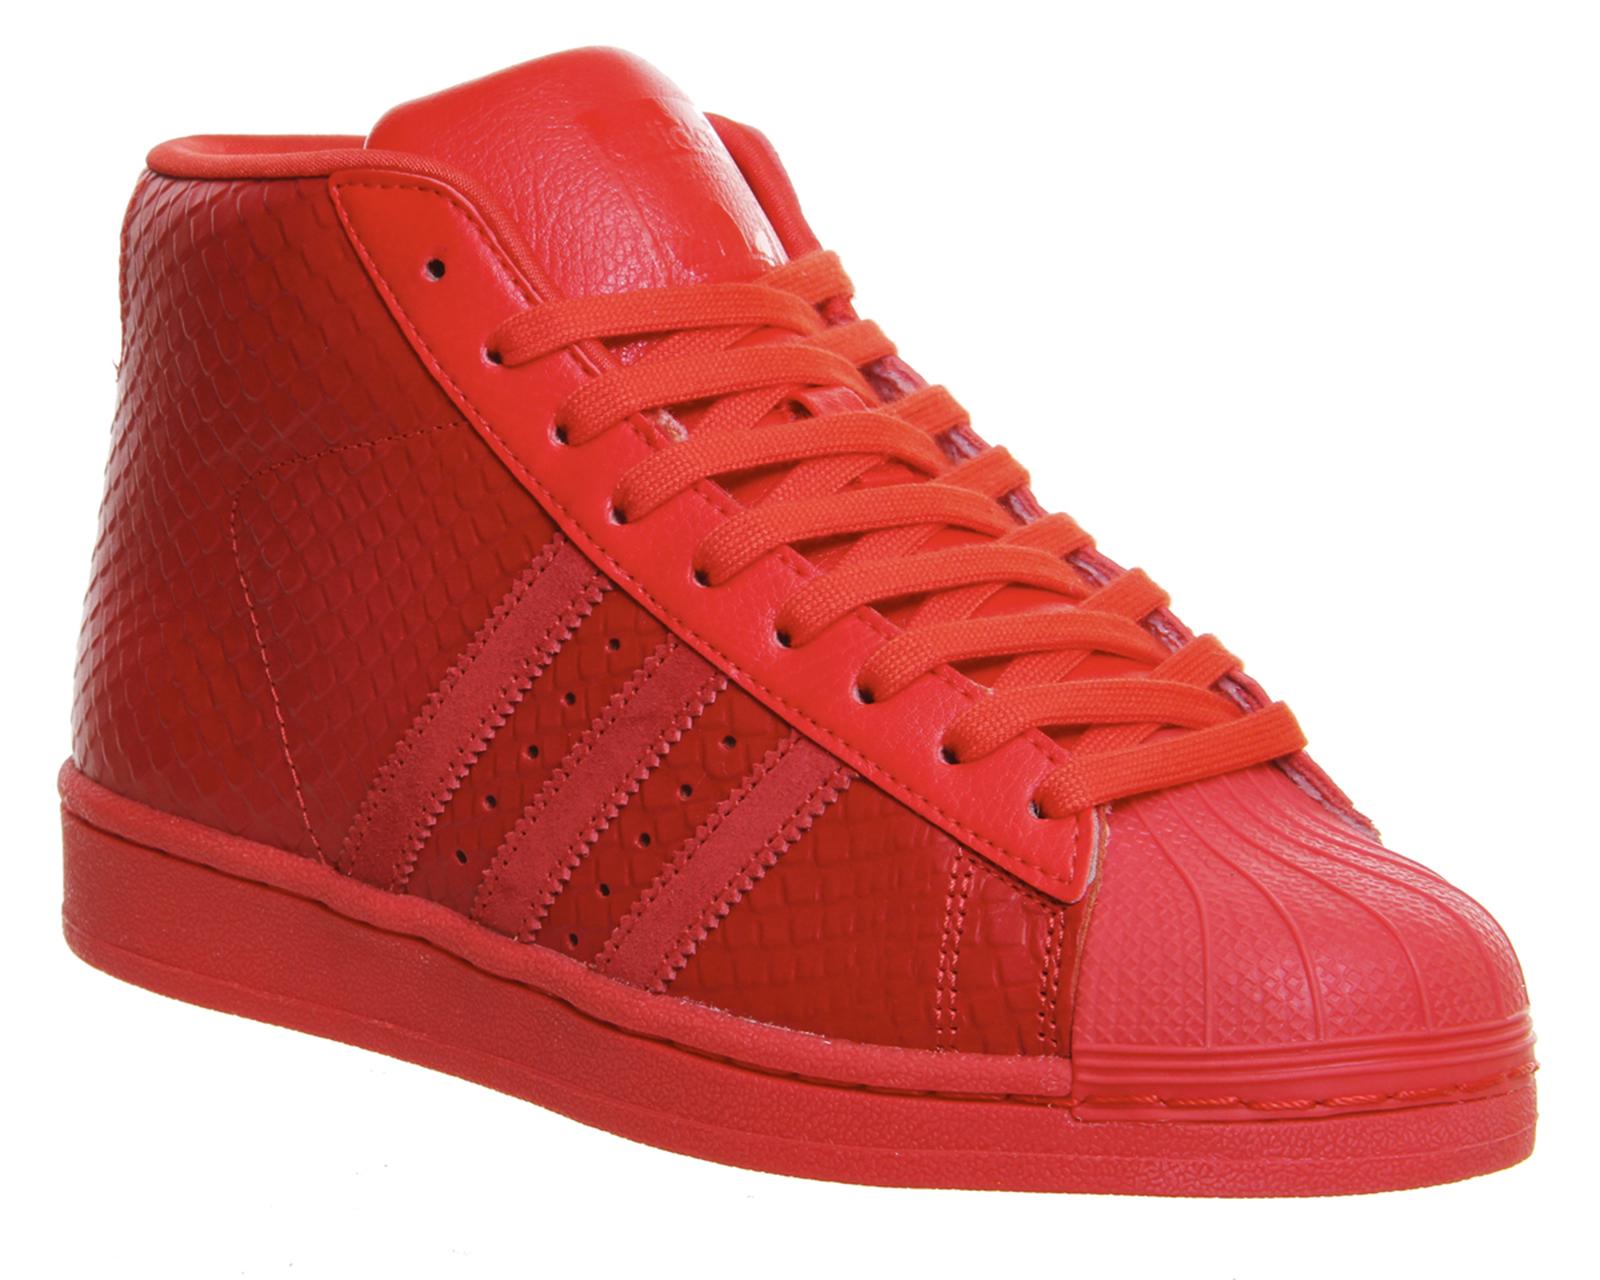 red high top shell toe \u003e Factory Store